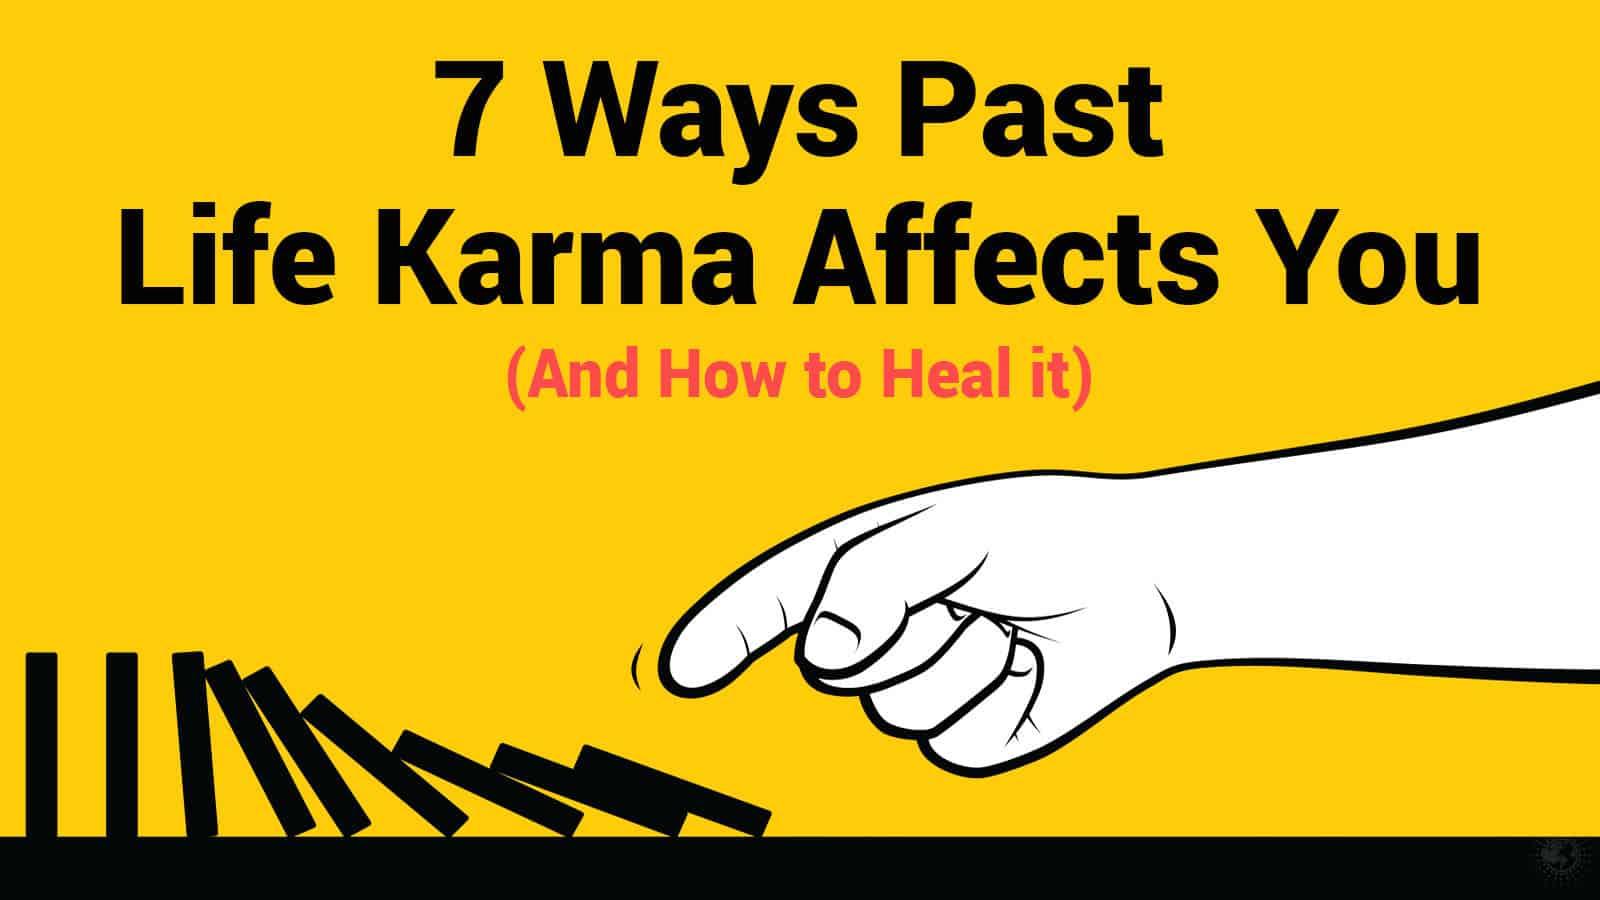 past life karma